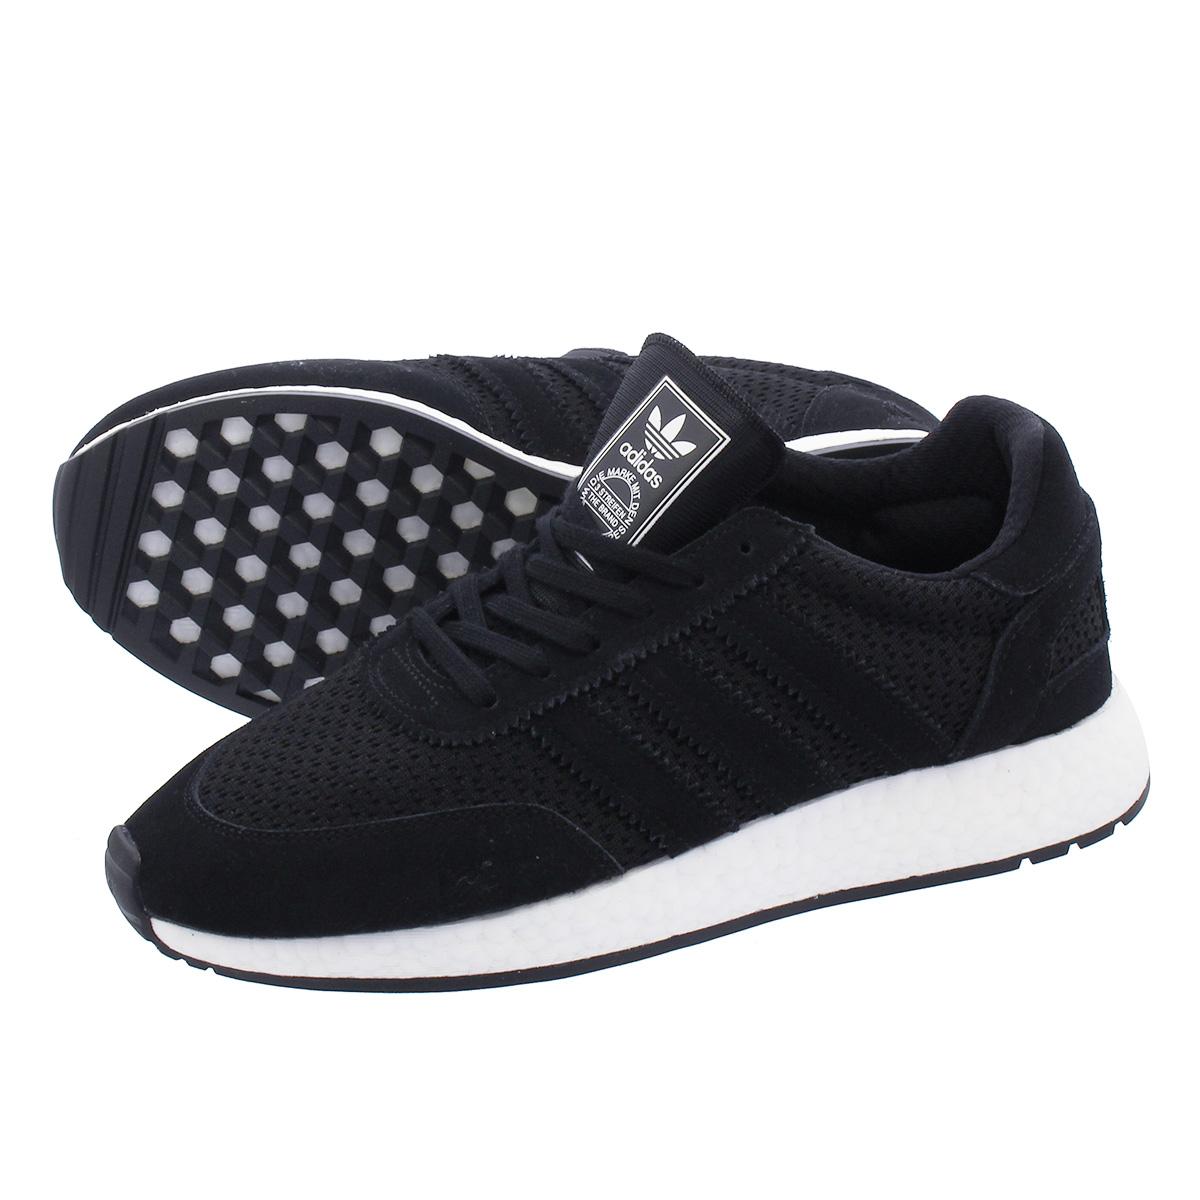 LOWTEX PLUS  adidas I-5923 INIKIRUNNER Adidas I-5923 イニキランナー CORE BLACK CORE  BLACK WHITE d96608  ce0a98f9f